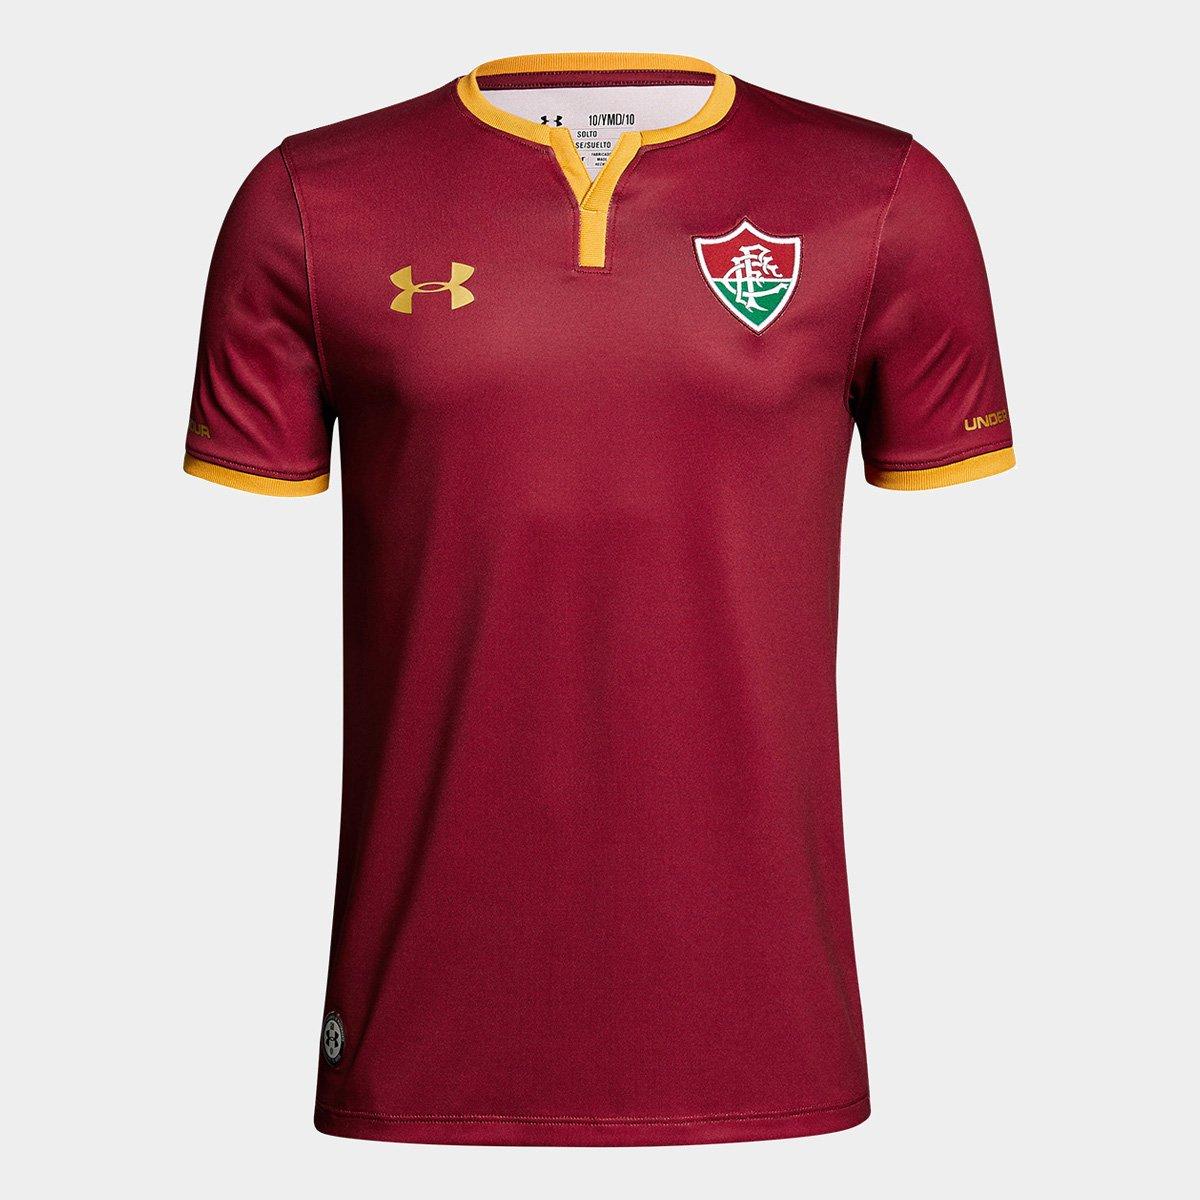 4ca6eb606f Camisa Fluminense III 17 18 s nº - Torcedor Under Armour Masculina - Bordô  - Compre Agora